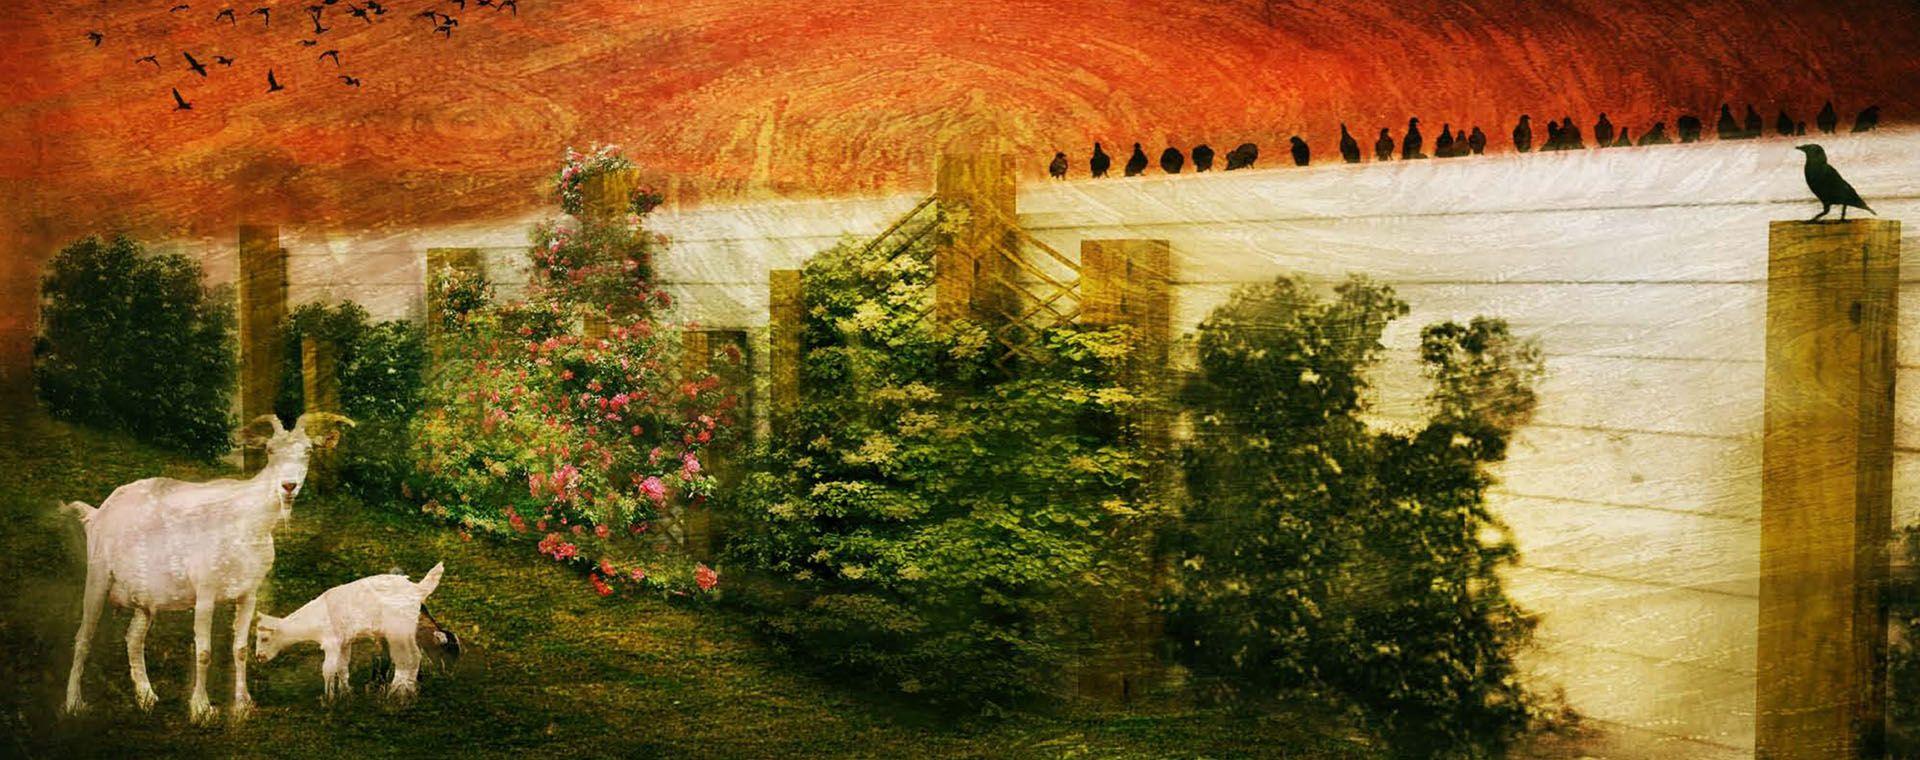 Garden Malé Vozokany